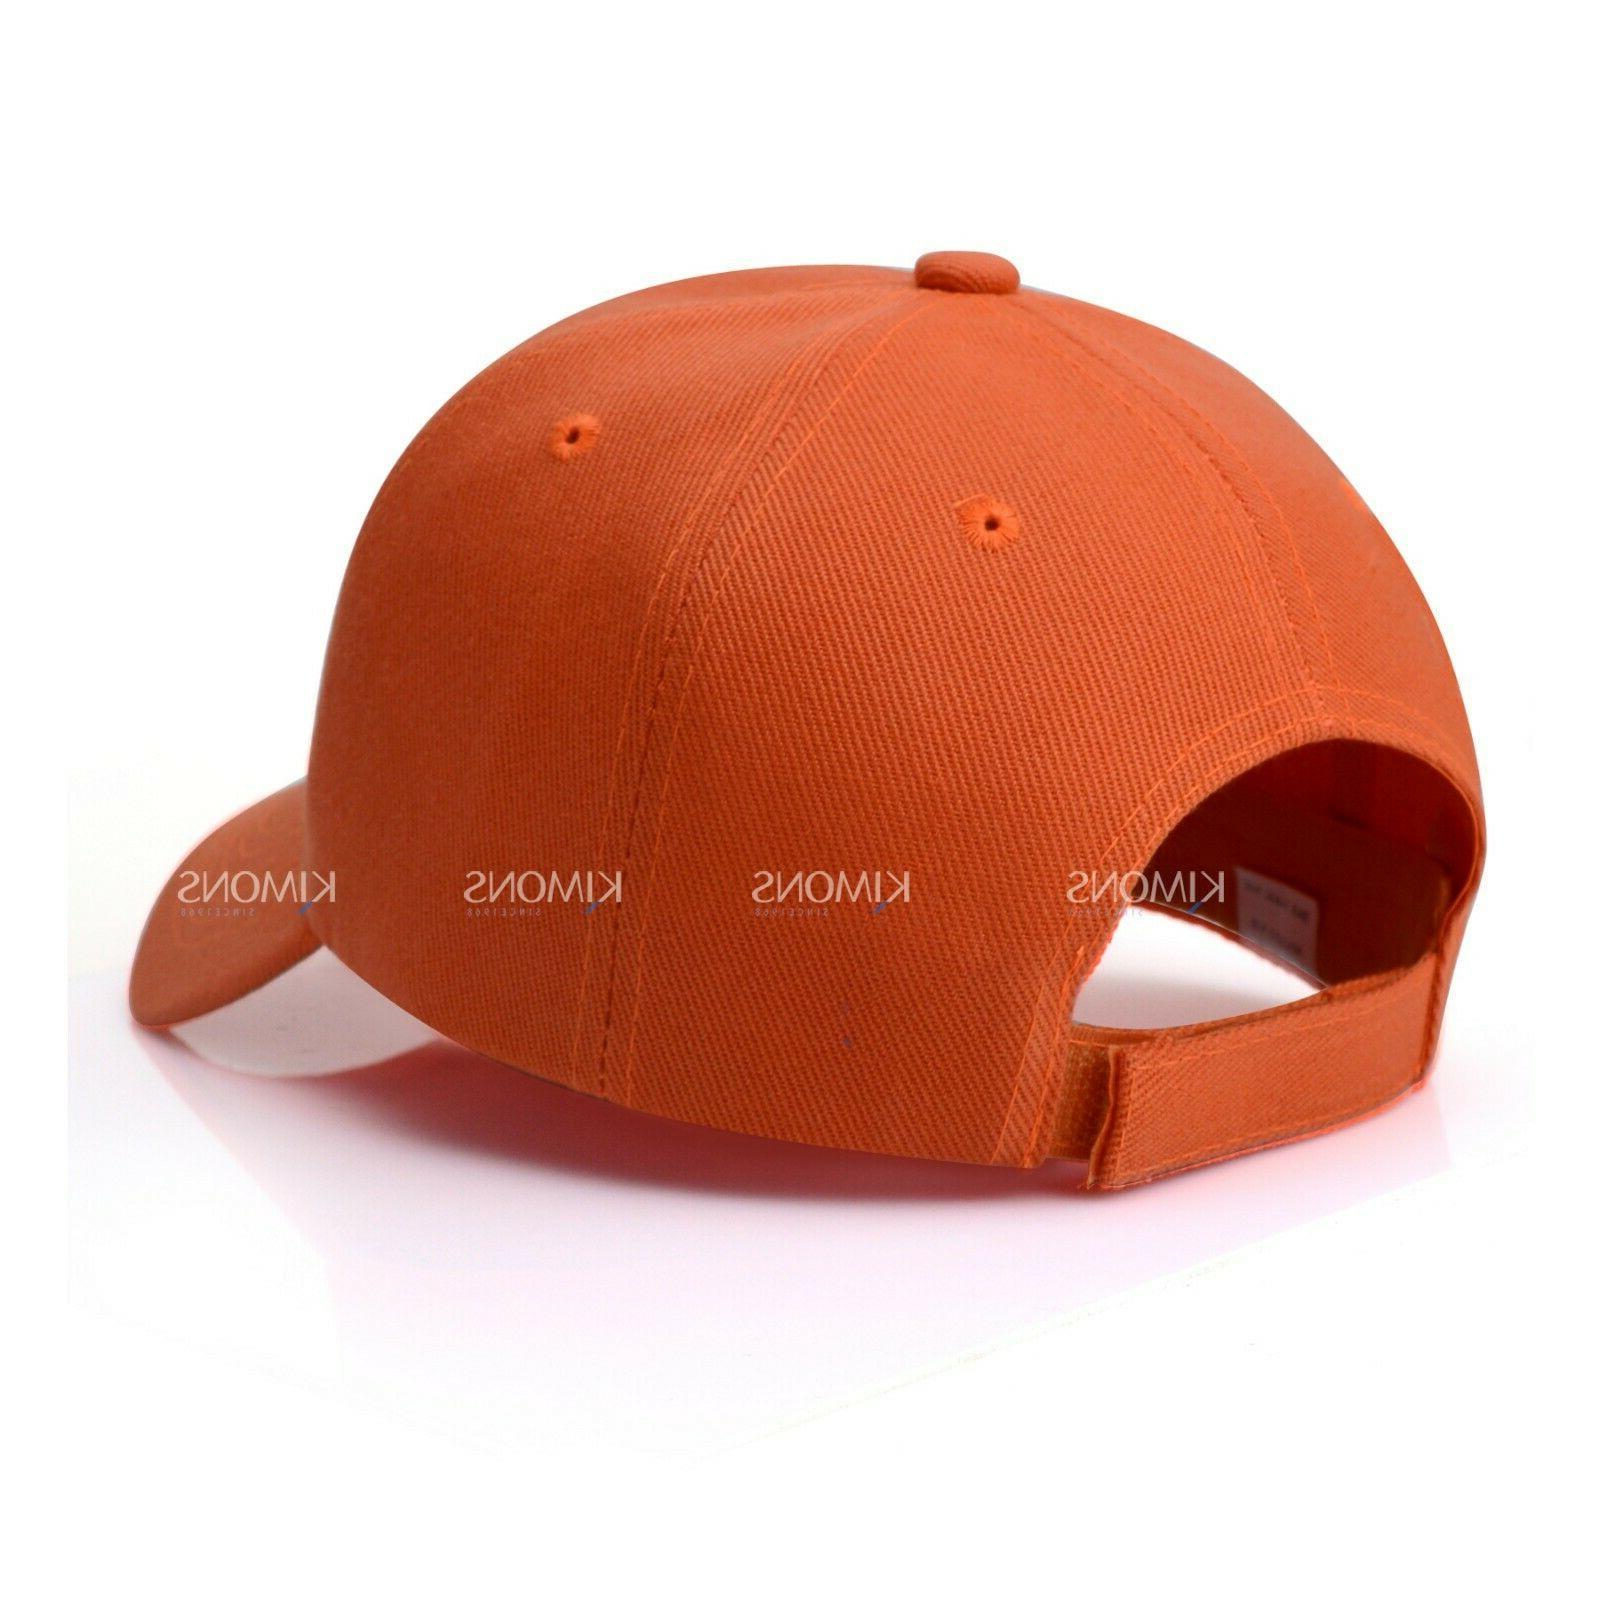 Loop Plain Cap Solid Color Blank Visor Hat Ball Men